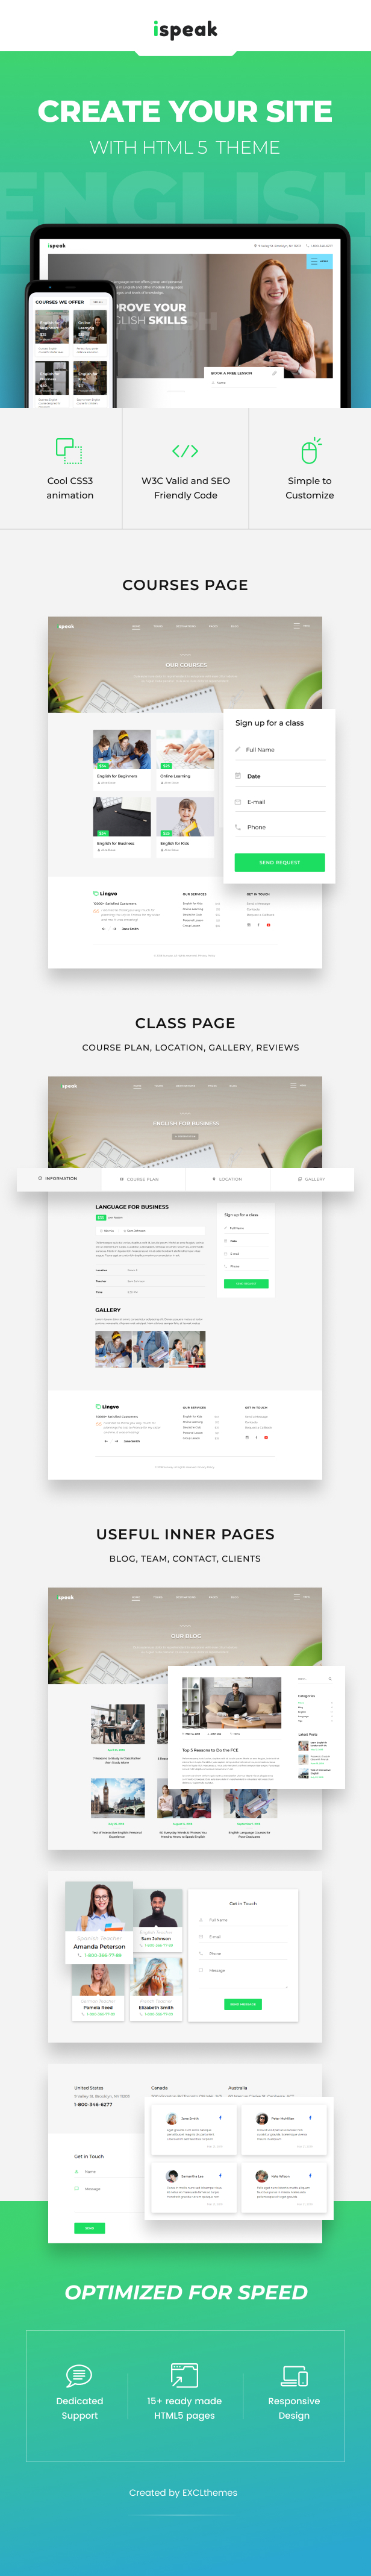 iSpeak - Online Education & Courses HTML Template